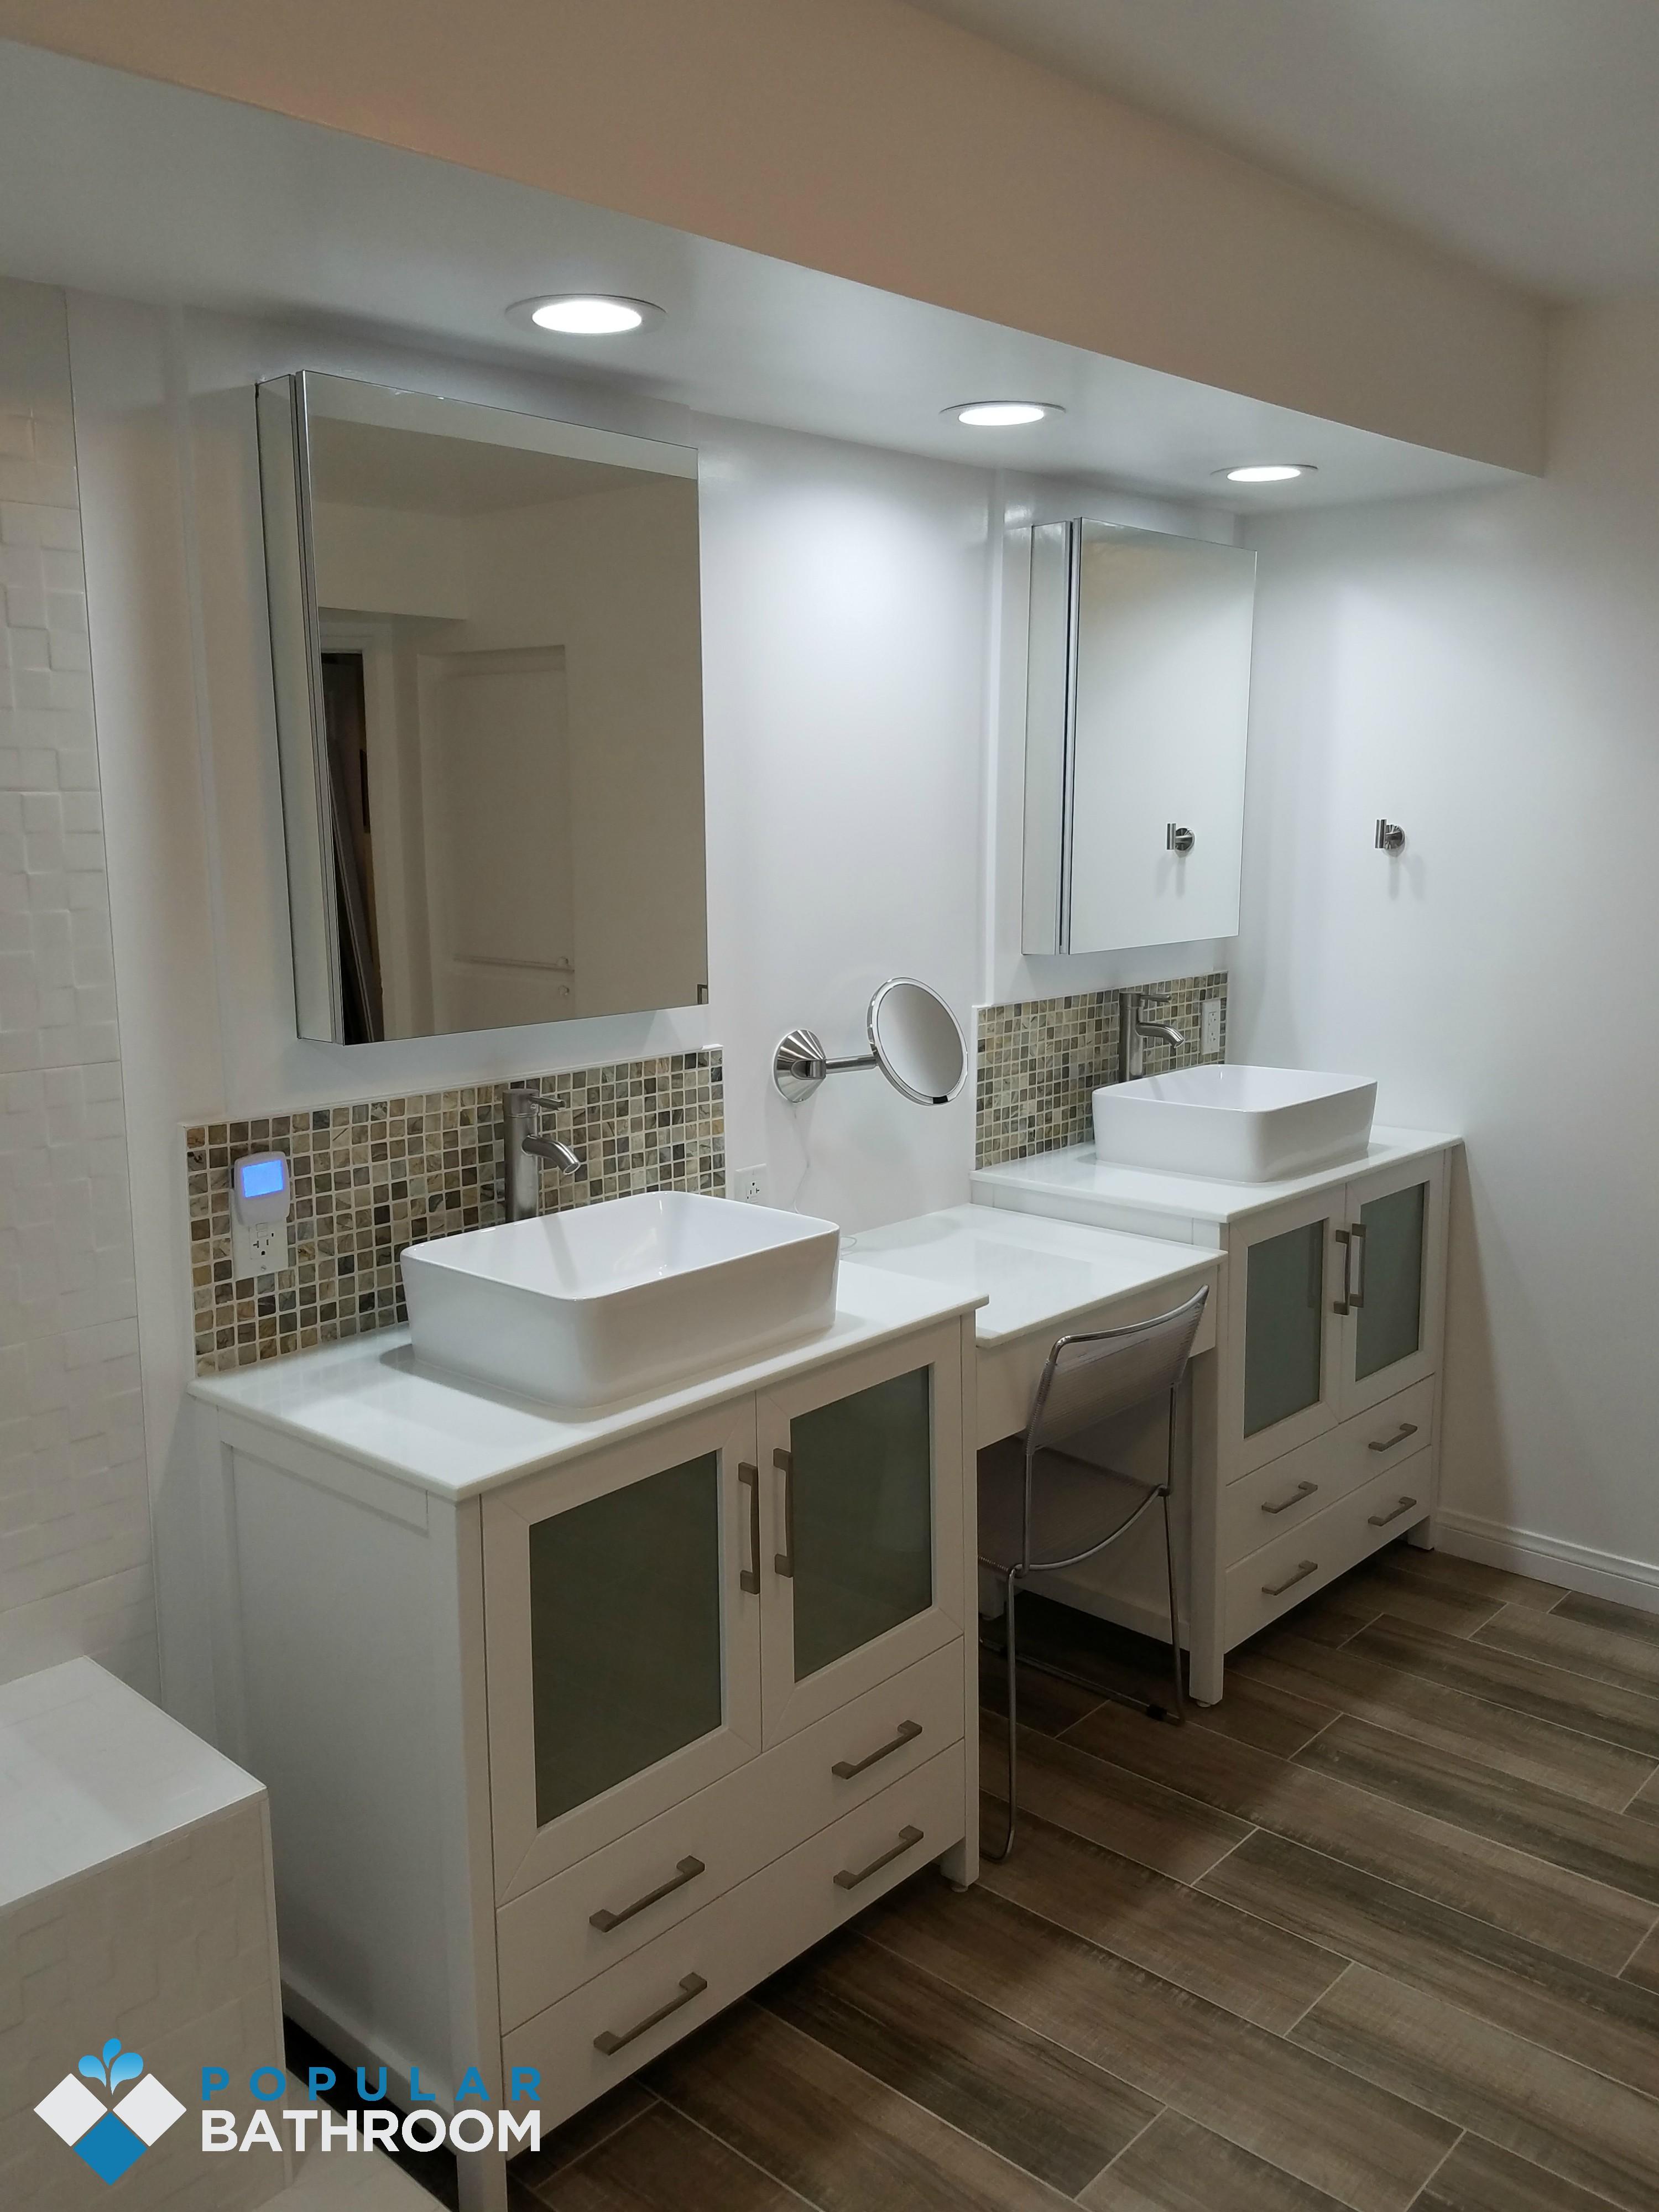 Popular Bathroom image 41